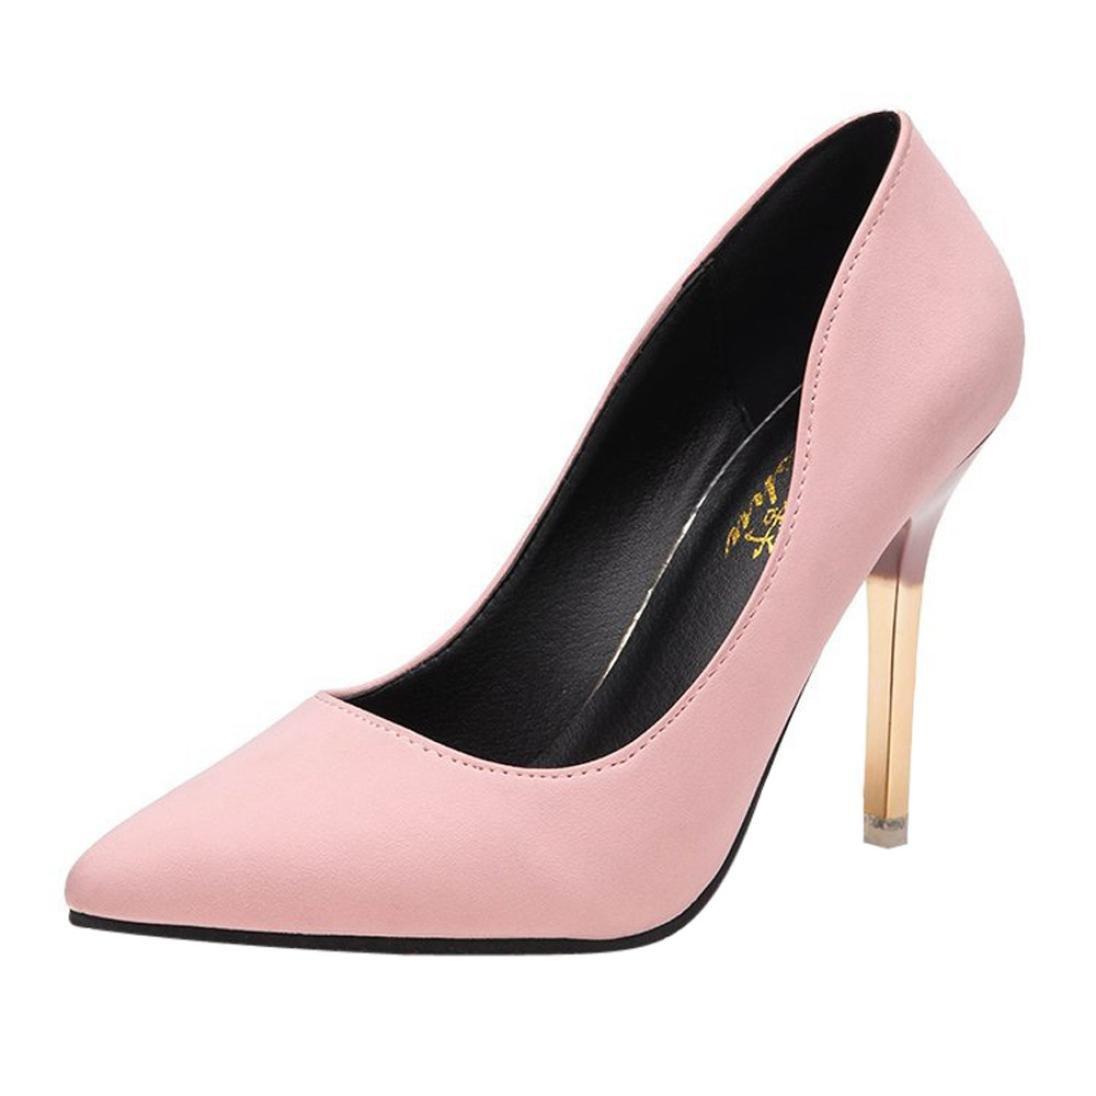 Inernet Damen Pumps Elegante High Heels mit Stilettoabsatz Flandell Glitzer Party Schuhe Abendschuhe Lack Metallic Plateauschuhe Hochzeitsschuhe Jennika Bequeme Lack Stilettos37 EU Rosa